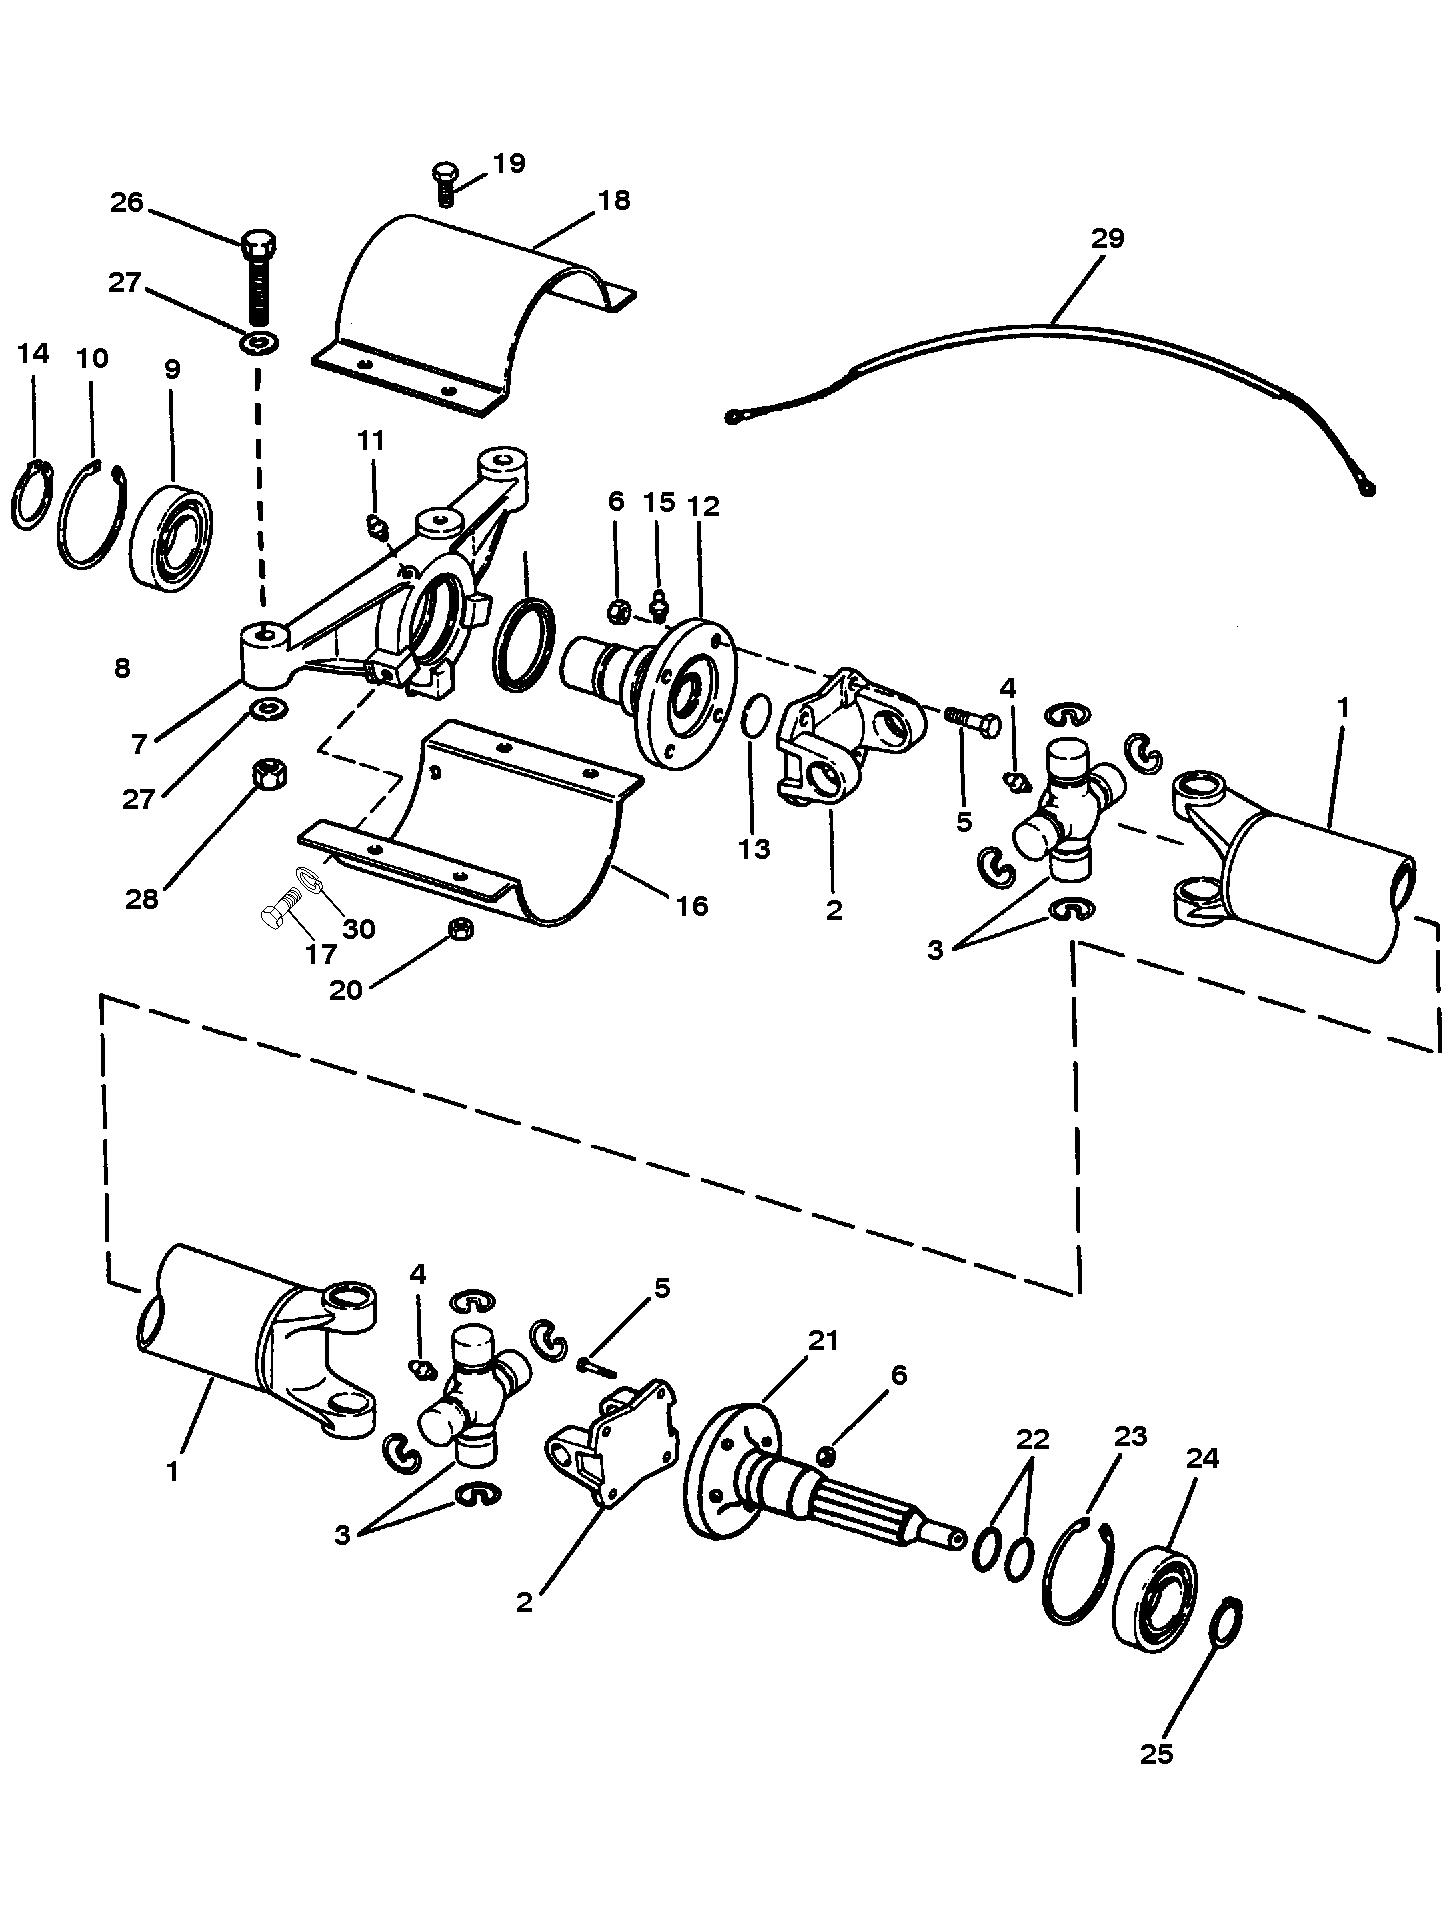 Race Sterndrive 500 Gen V Gm 502 V 8 0f Thru 0f